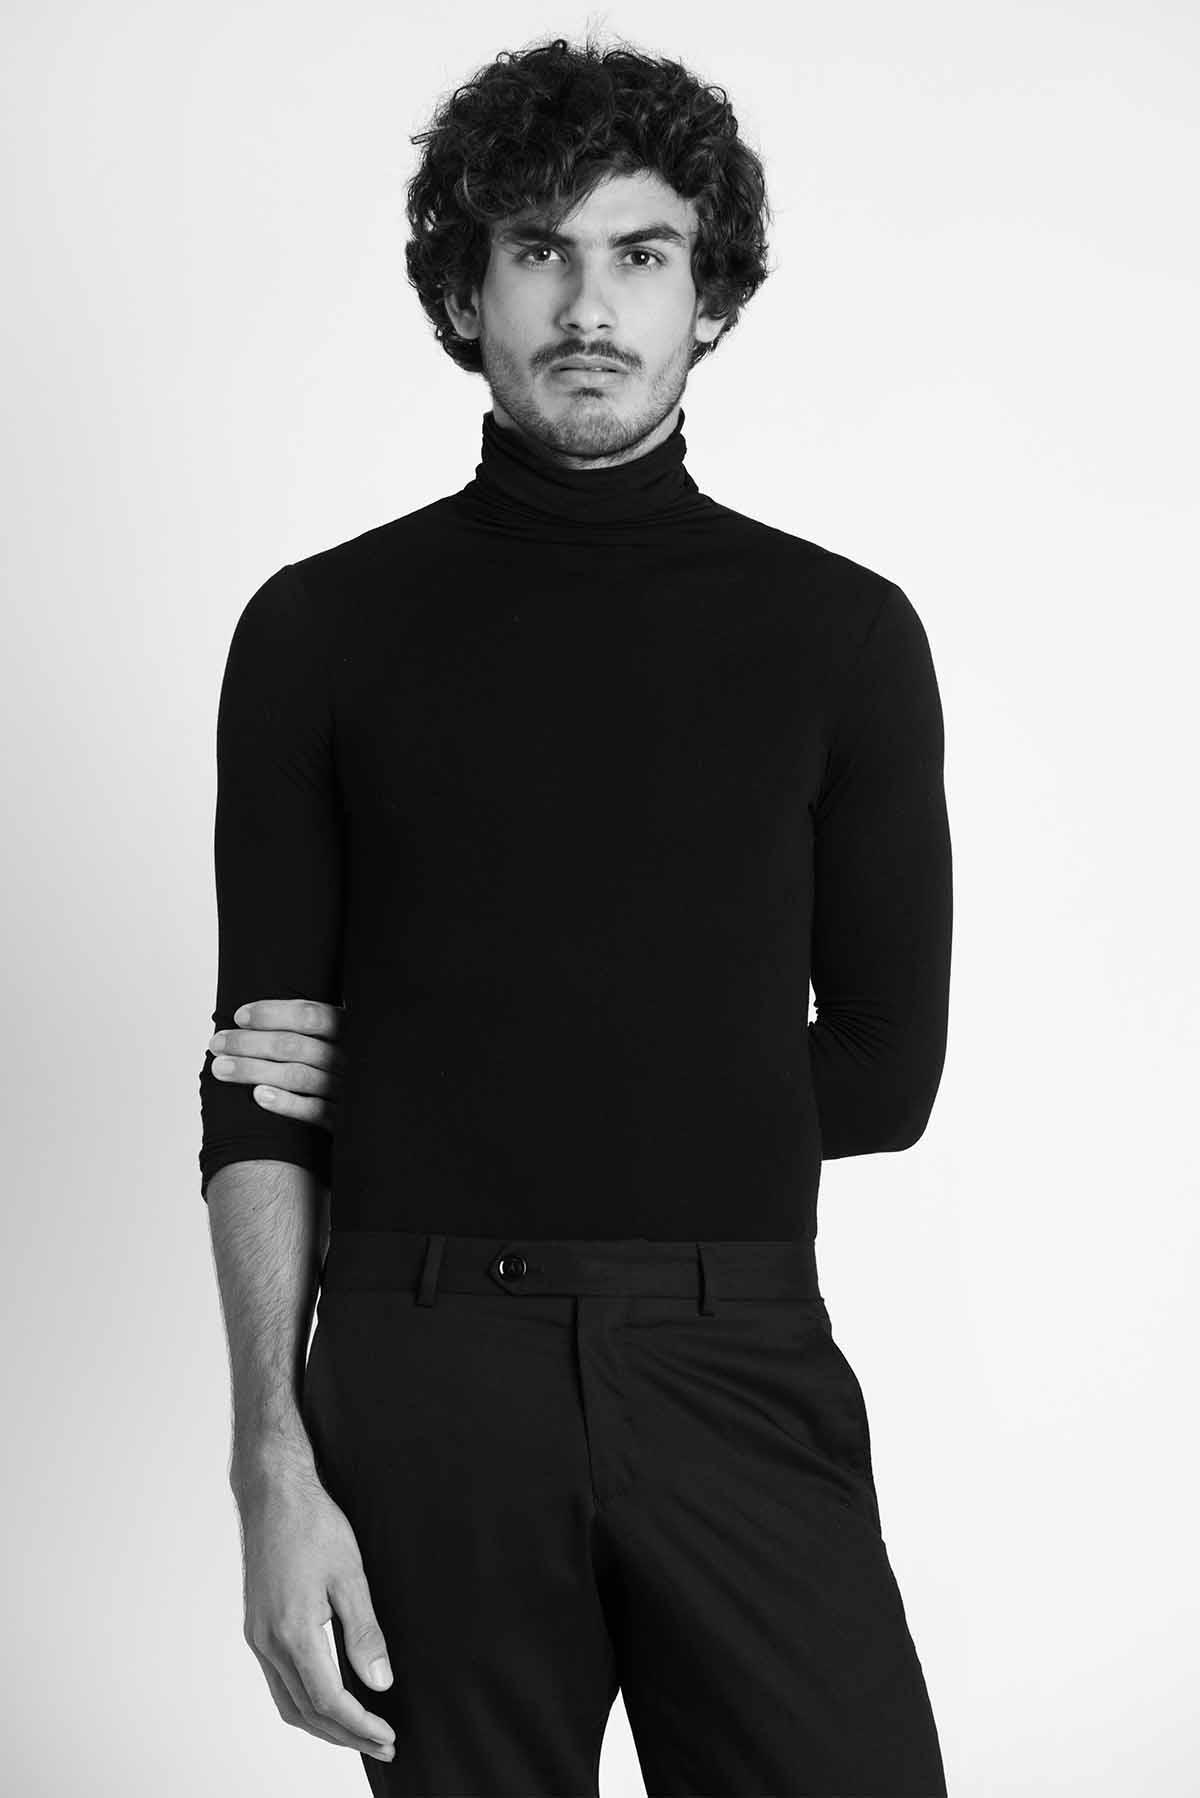 Jacob Lenk by Leandro Ramos for Brazilian Male Model